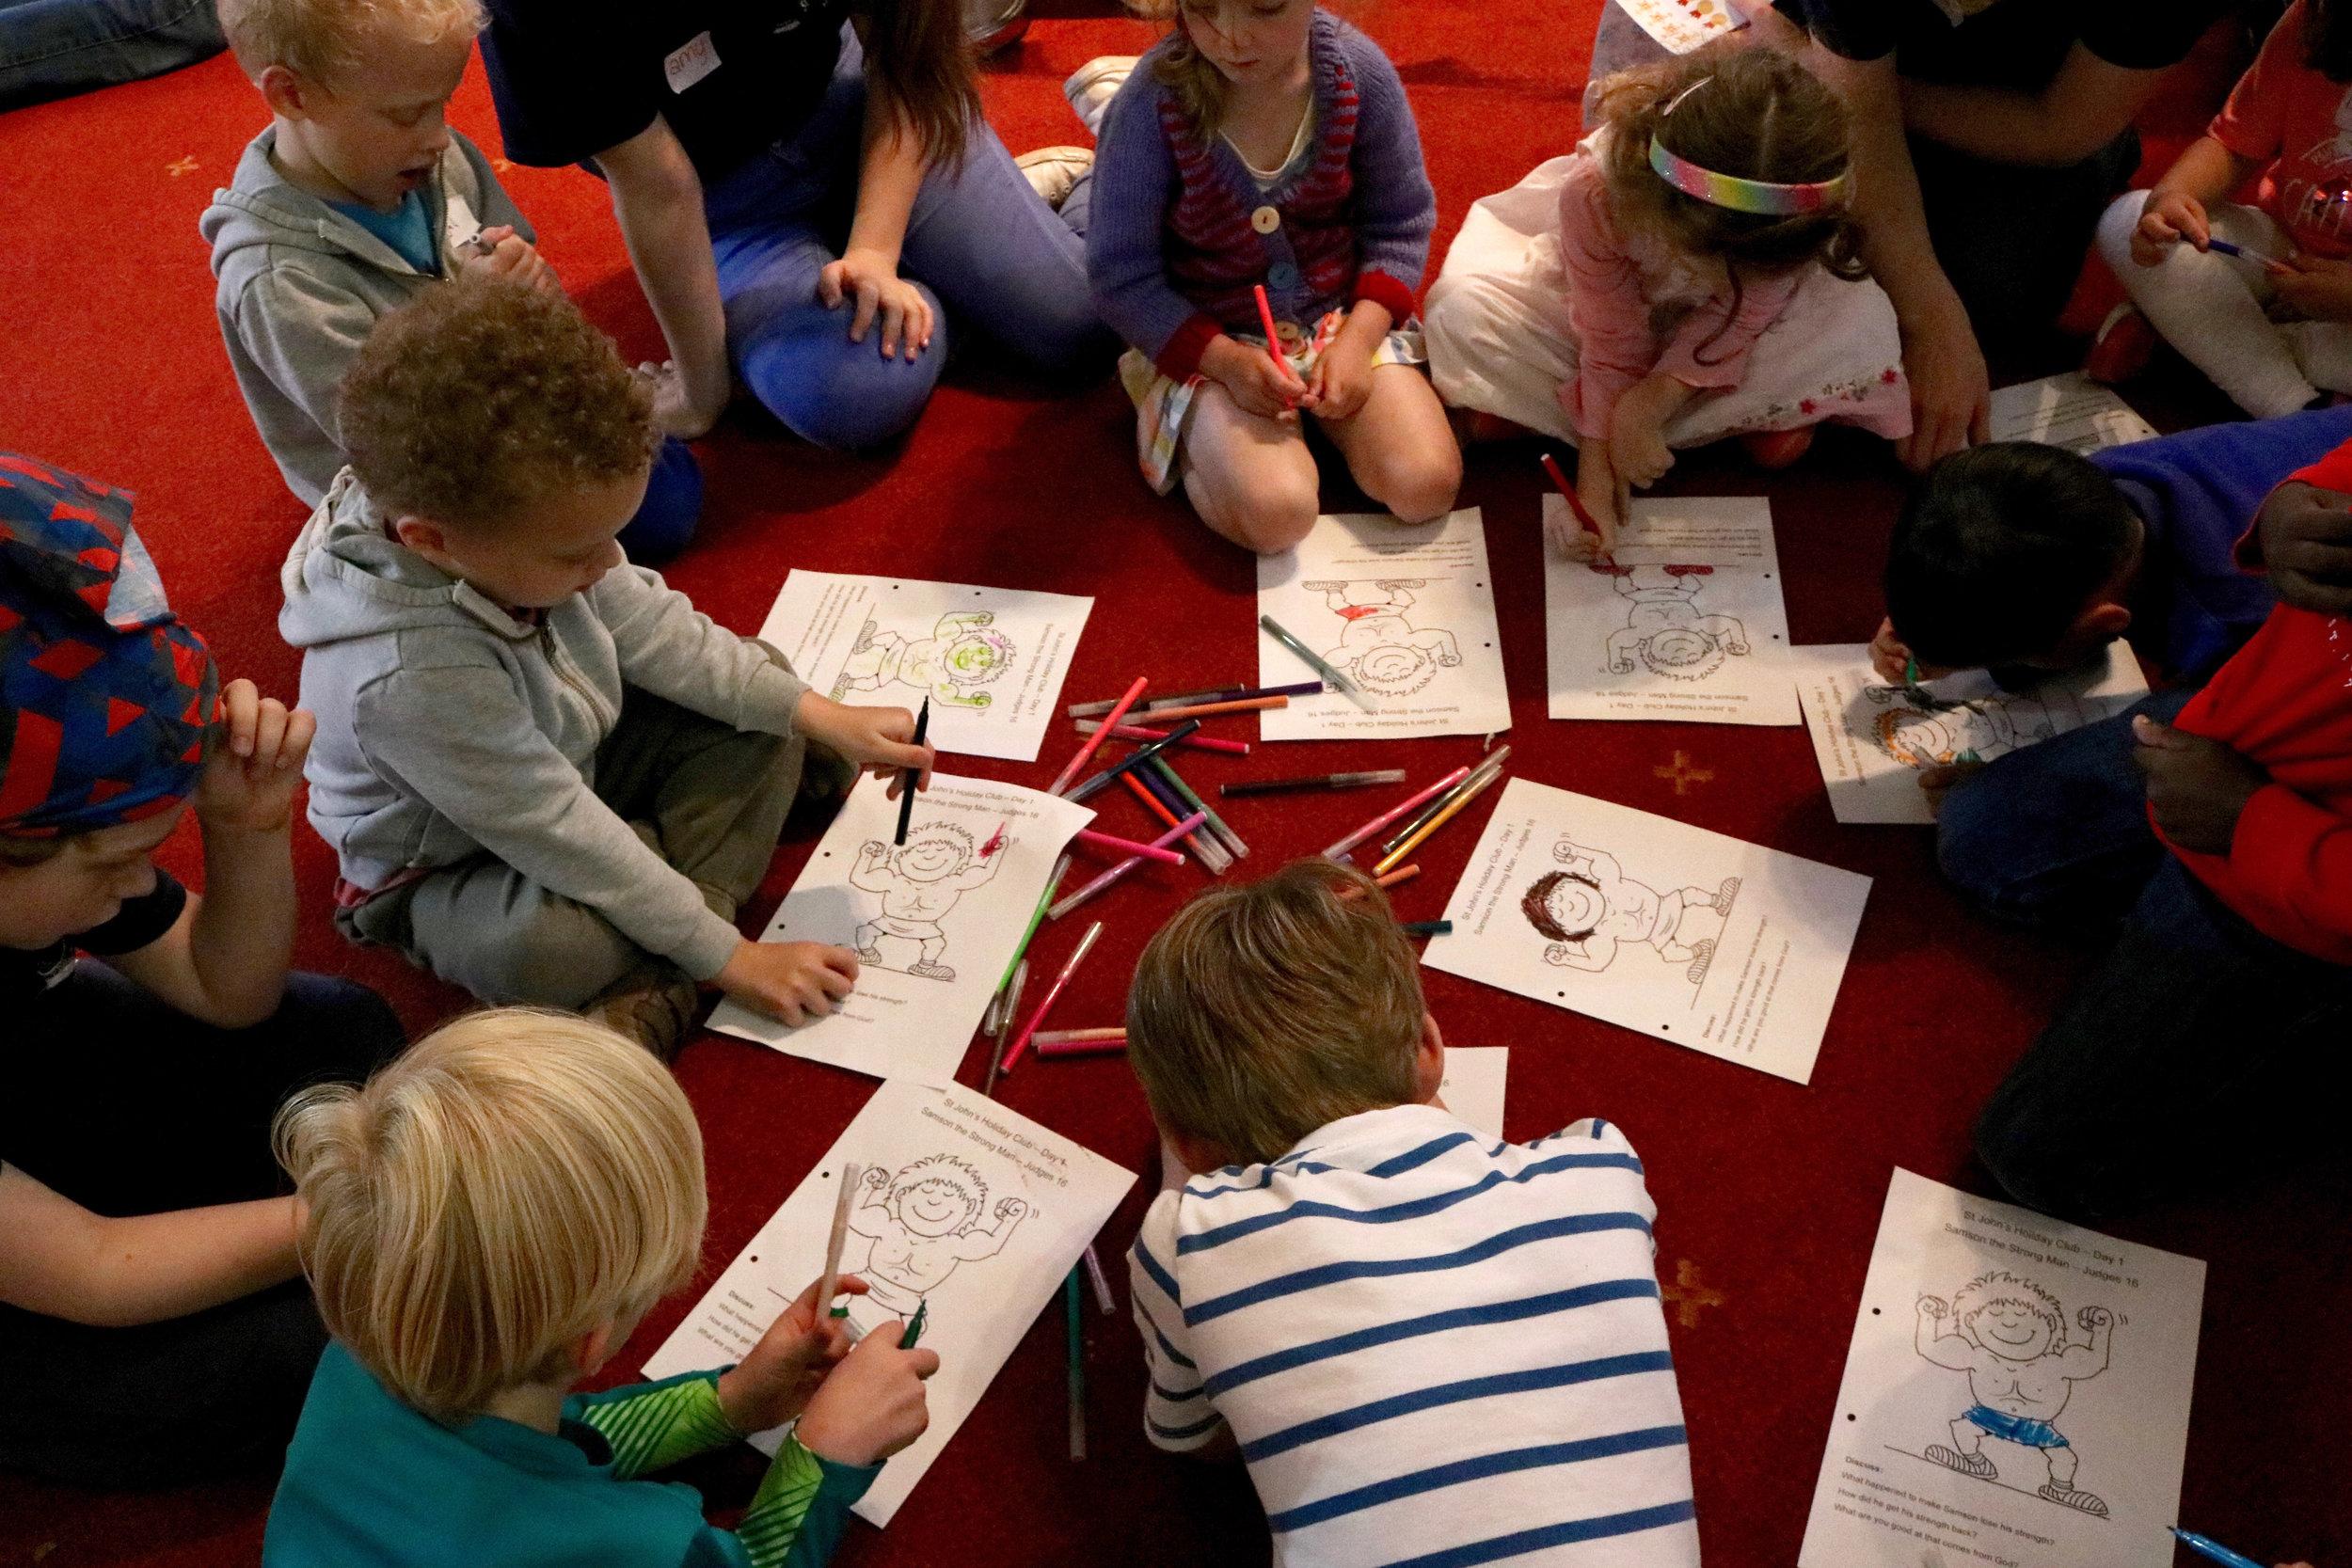 st-johns-harborne-children-playing-web.jpg